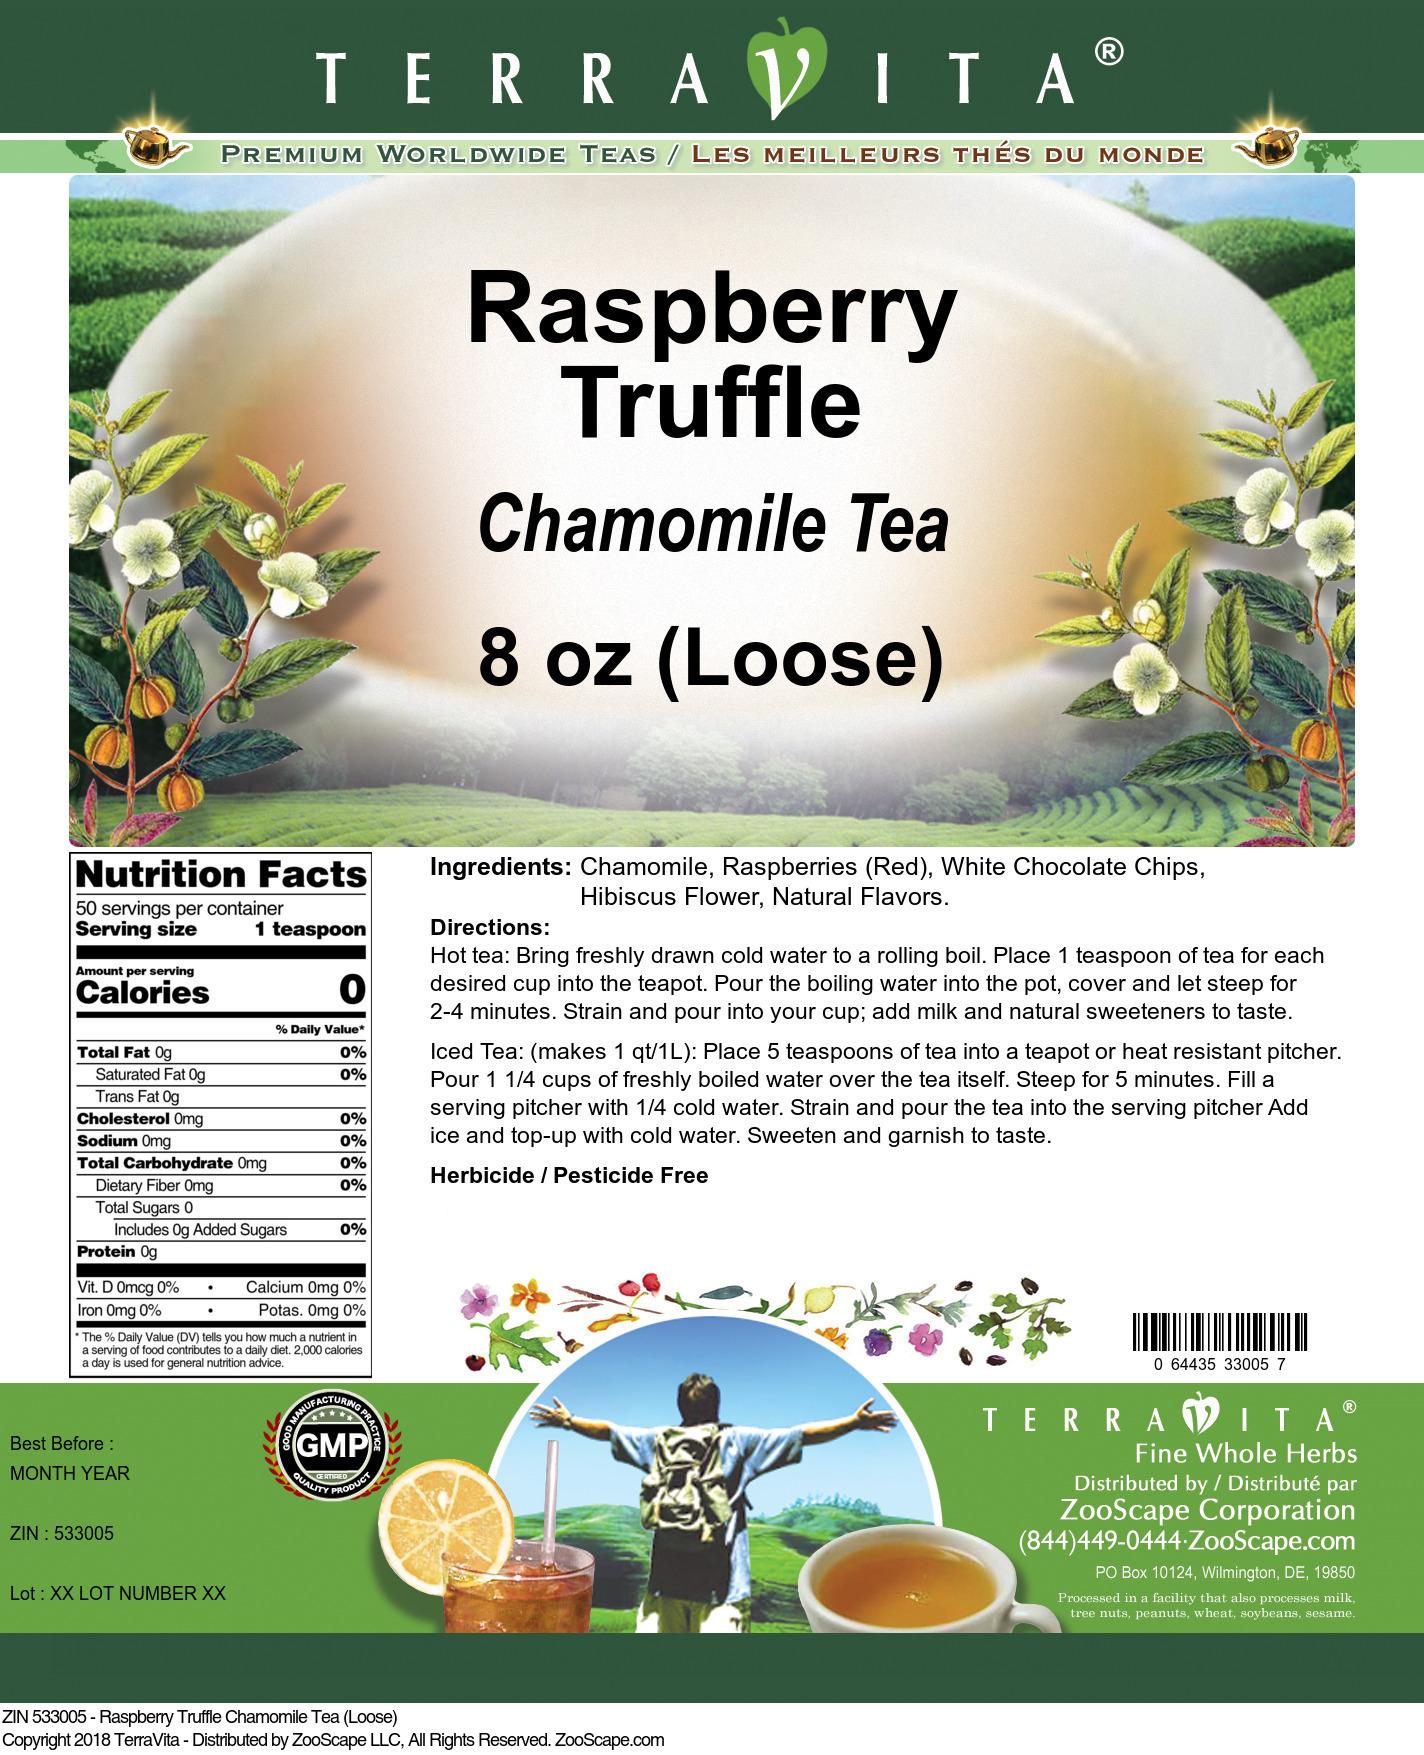 Raspberry Truffle Chamomile Tea